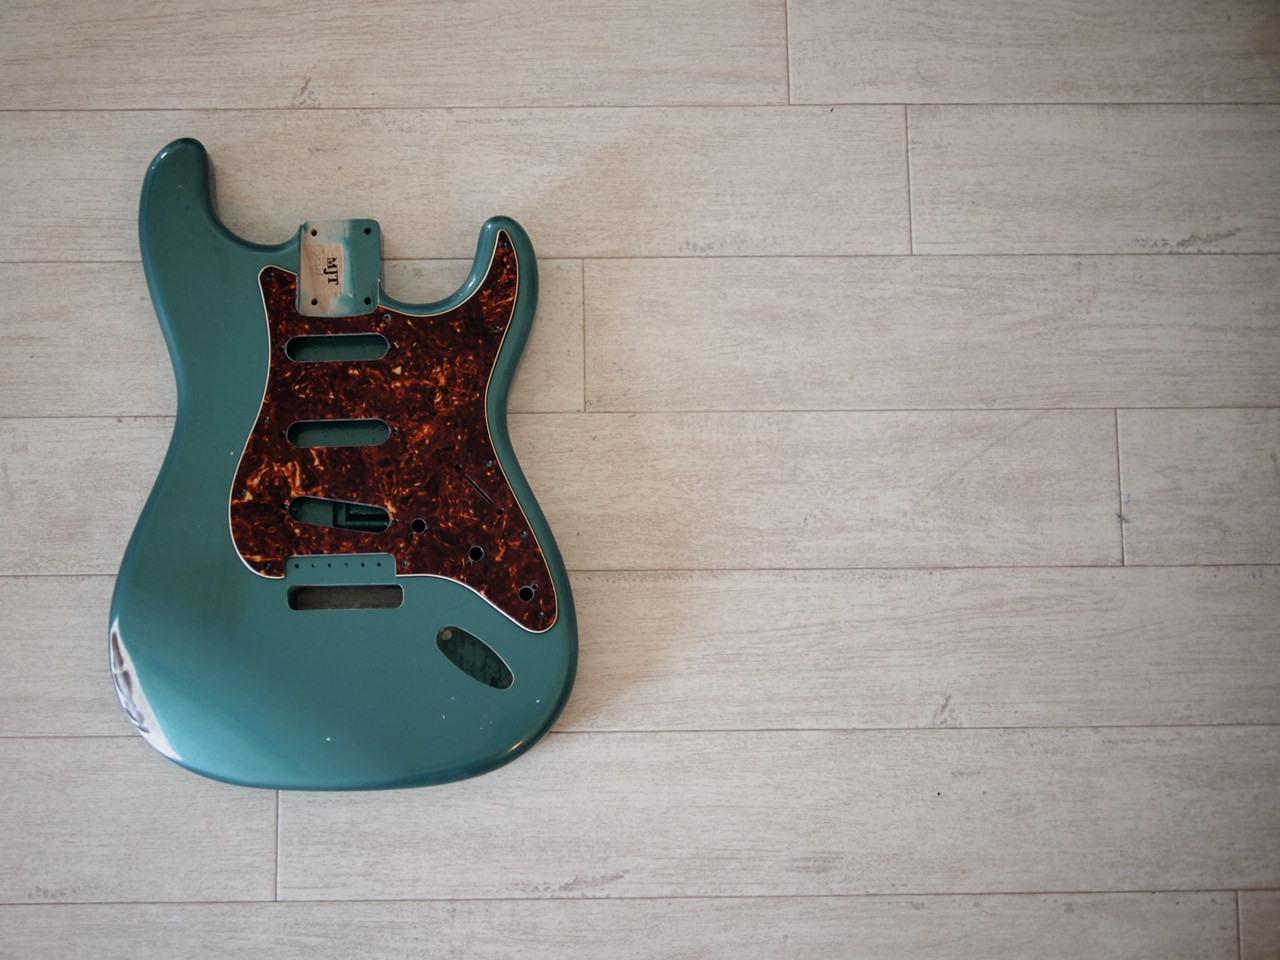 MJT Stratocaster Body - Swamp Ash - Sherwood Green - Medium Relic